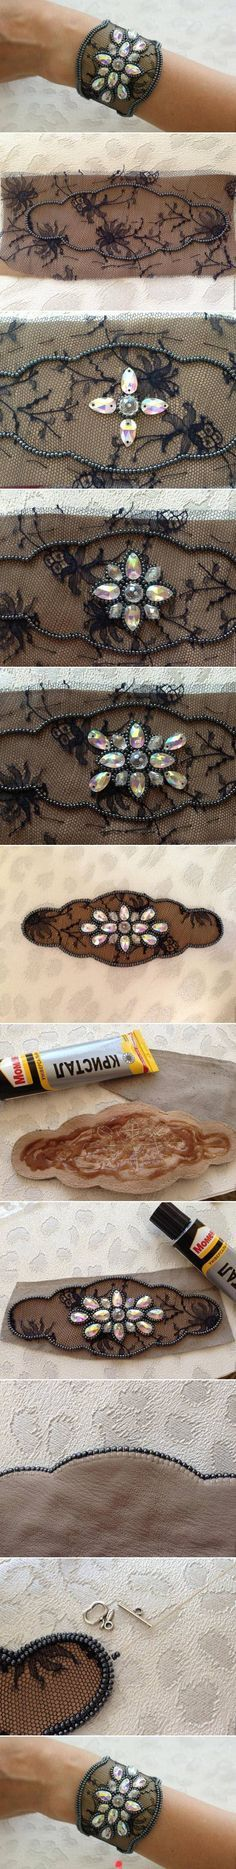 black lace n pearls- lace cuff